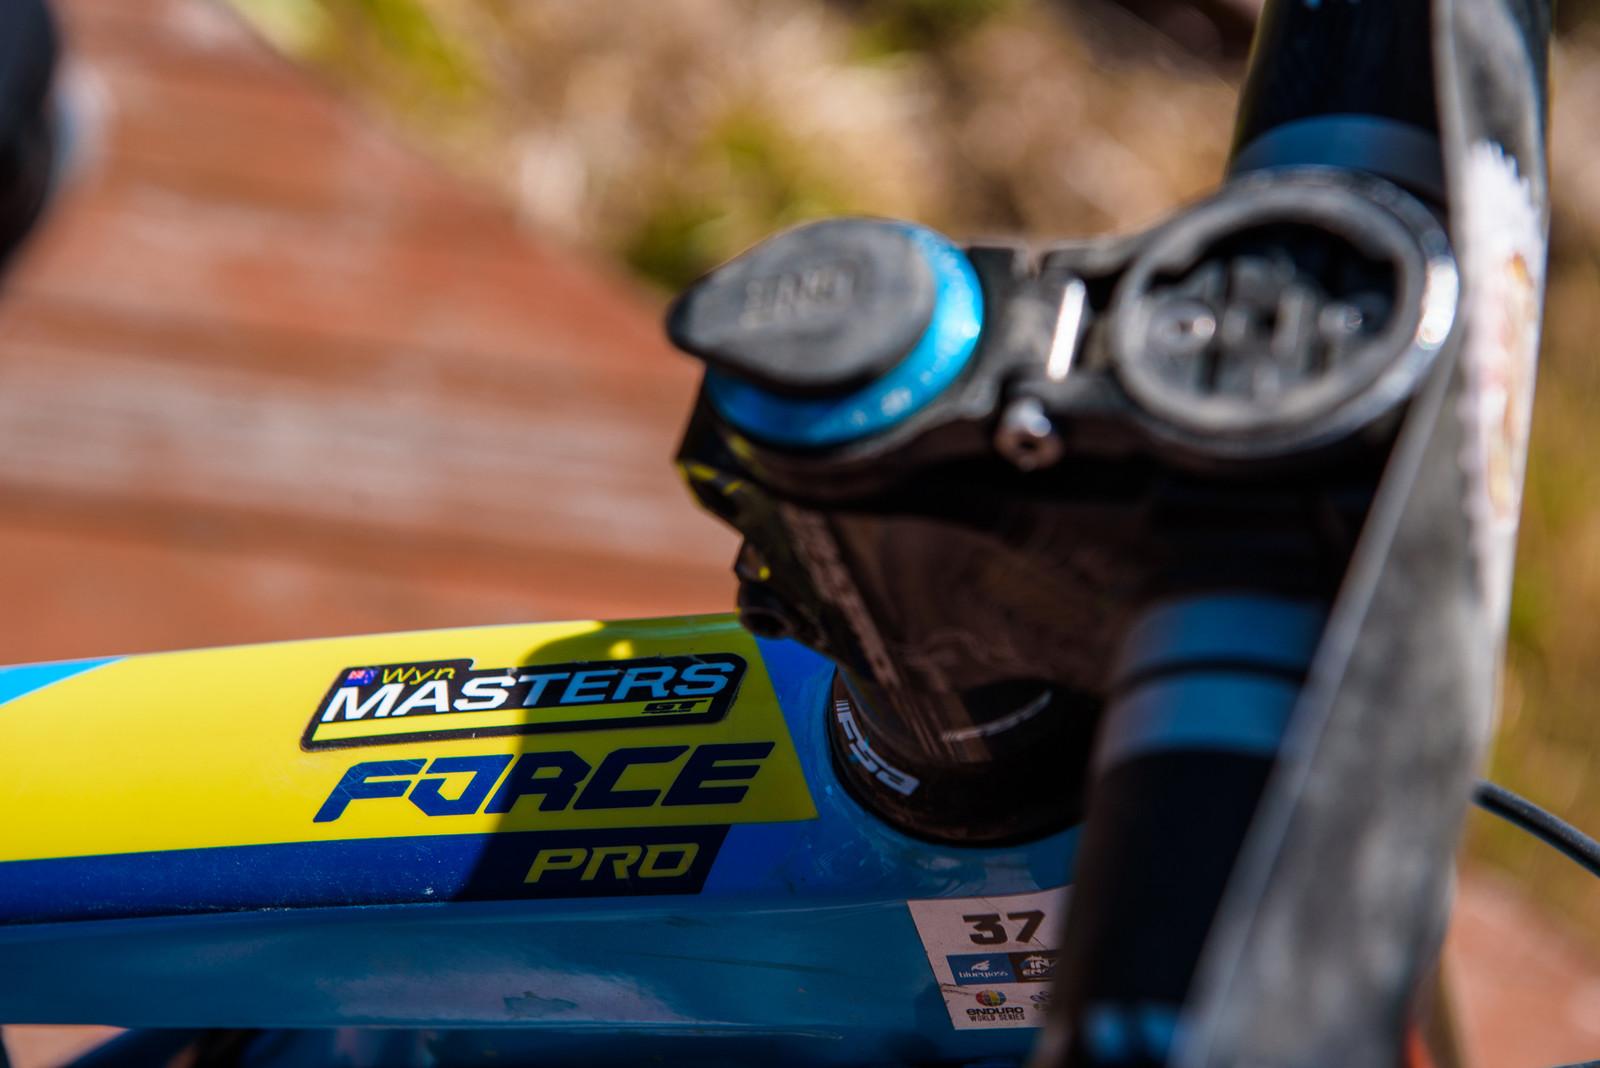 Force Master 5000 - Pro Bike - Wyn Masters' GT Force, Size XL - Mountain Biking Pictures - Vital MTB